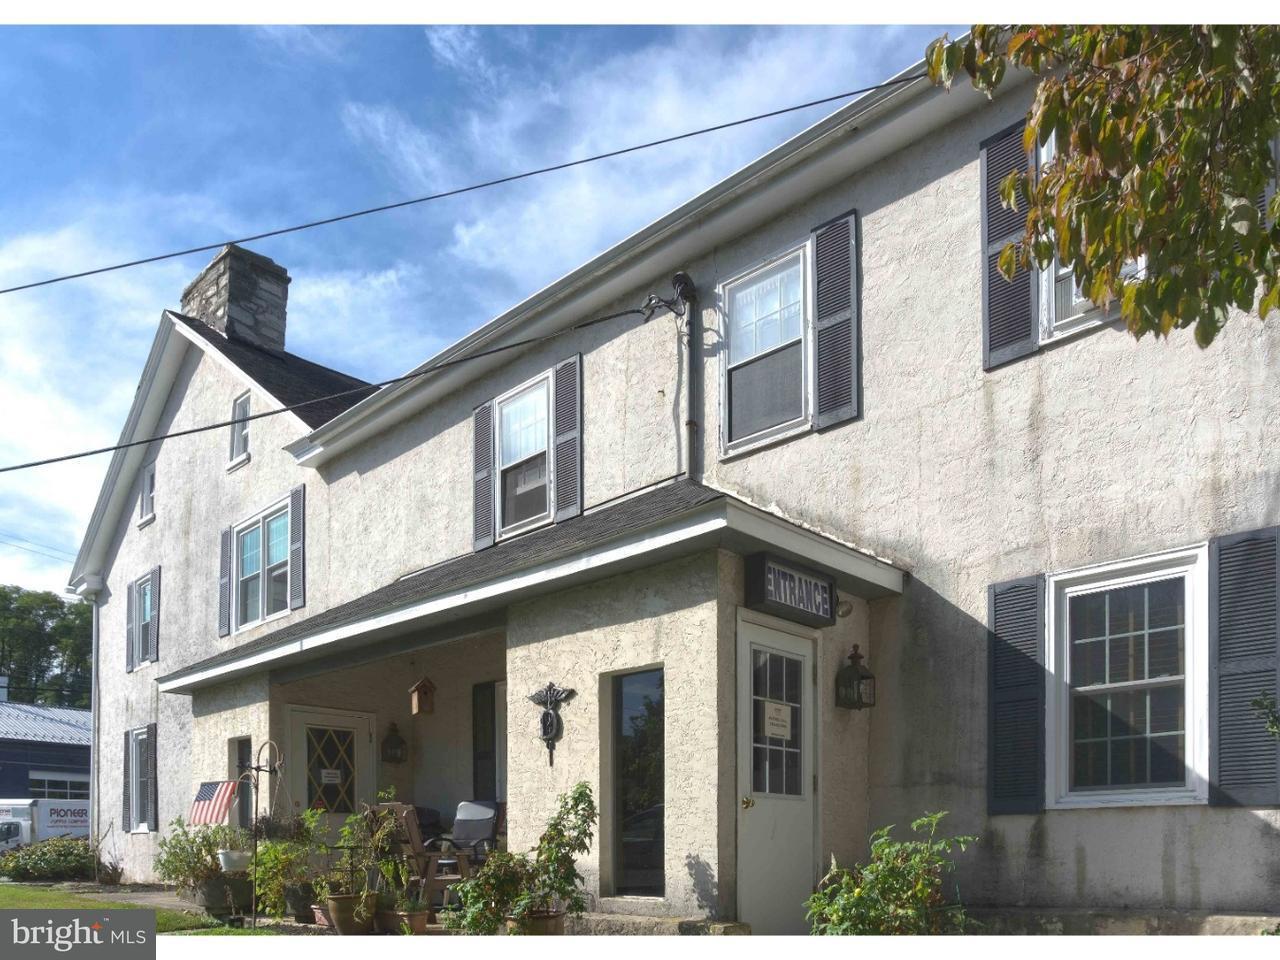 4215 W Lincoln Downingtown , PA 19335